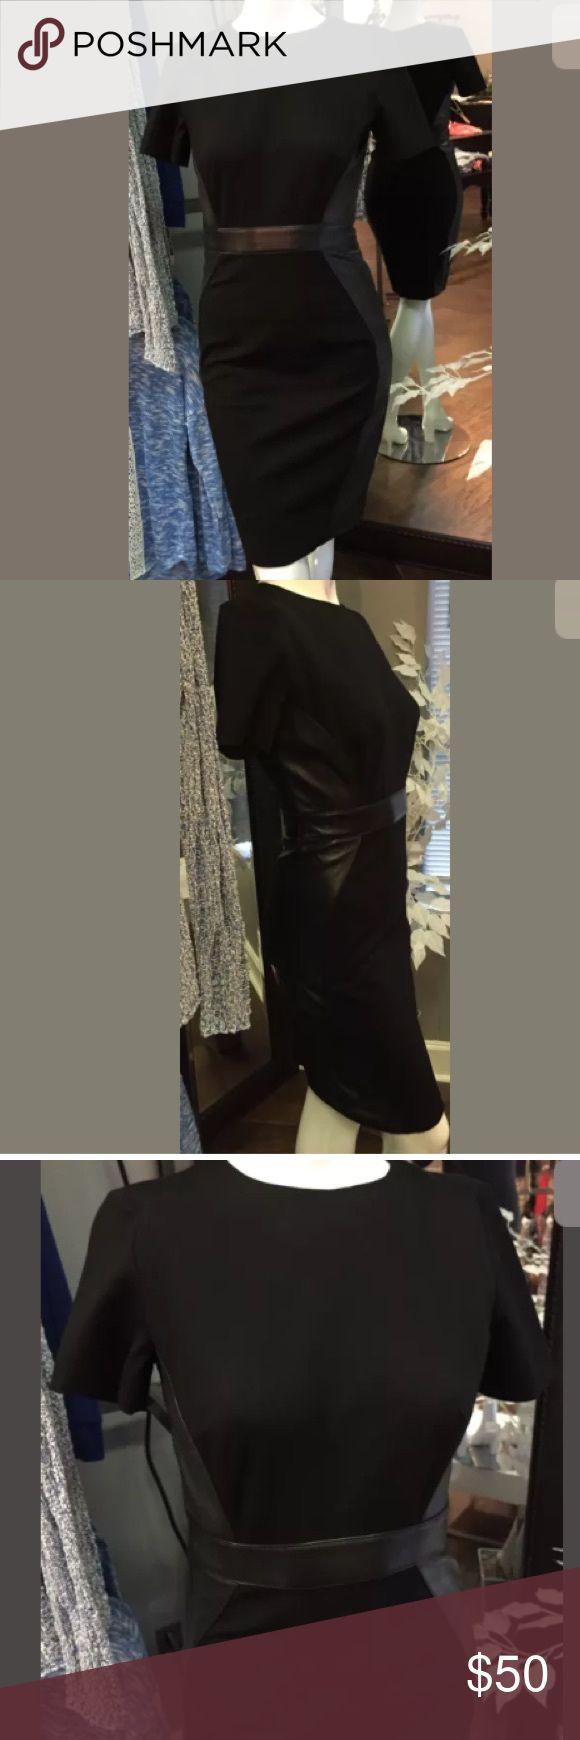 NEW YEARS SALE!🎉 ONLY $45! Antonio Melani Dress NWT Antonio Melani Women's Dress Size 0 RT $179 ON SALE!🎉🎊 ANTONIO MELANI Dresses